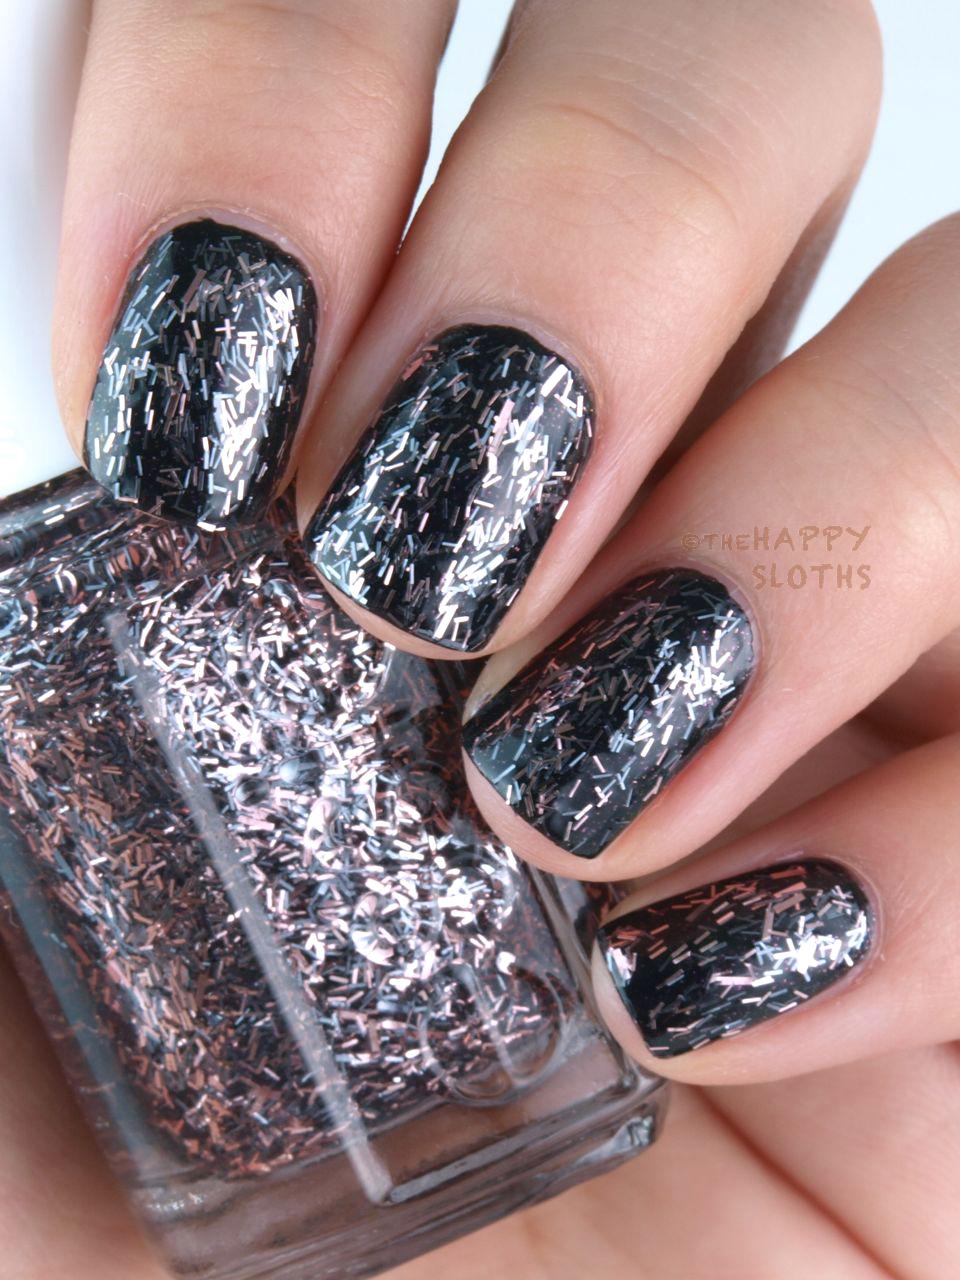 Essie Glitter Nail Polish Review – Papillon Day Spa